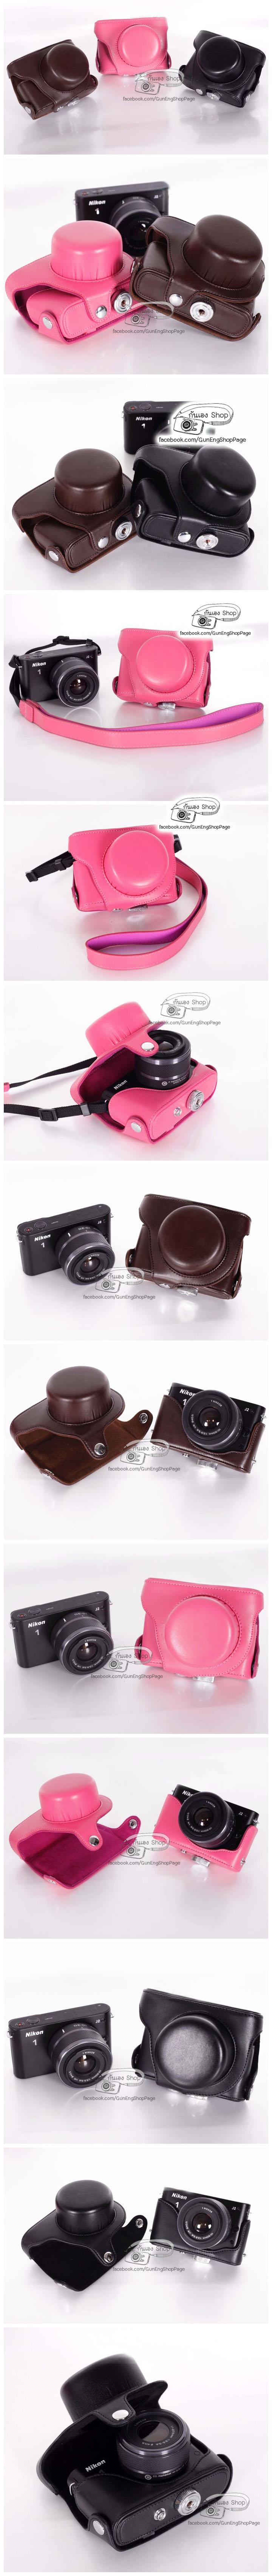 Case Nikon J1 J2 เลนส์ 11-27.5 mm